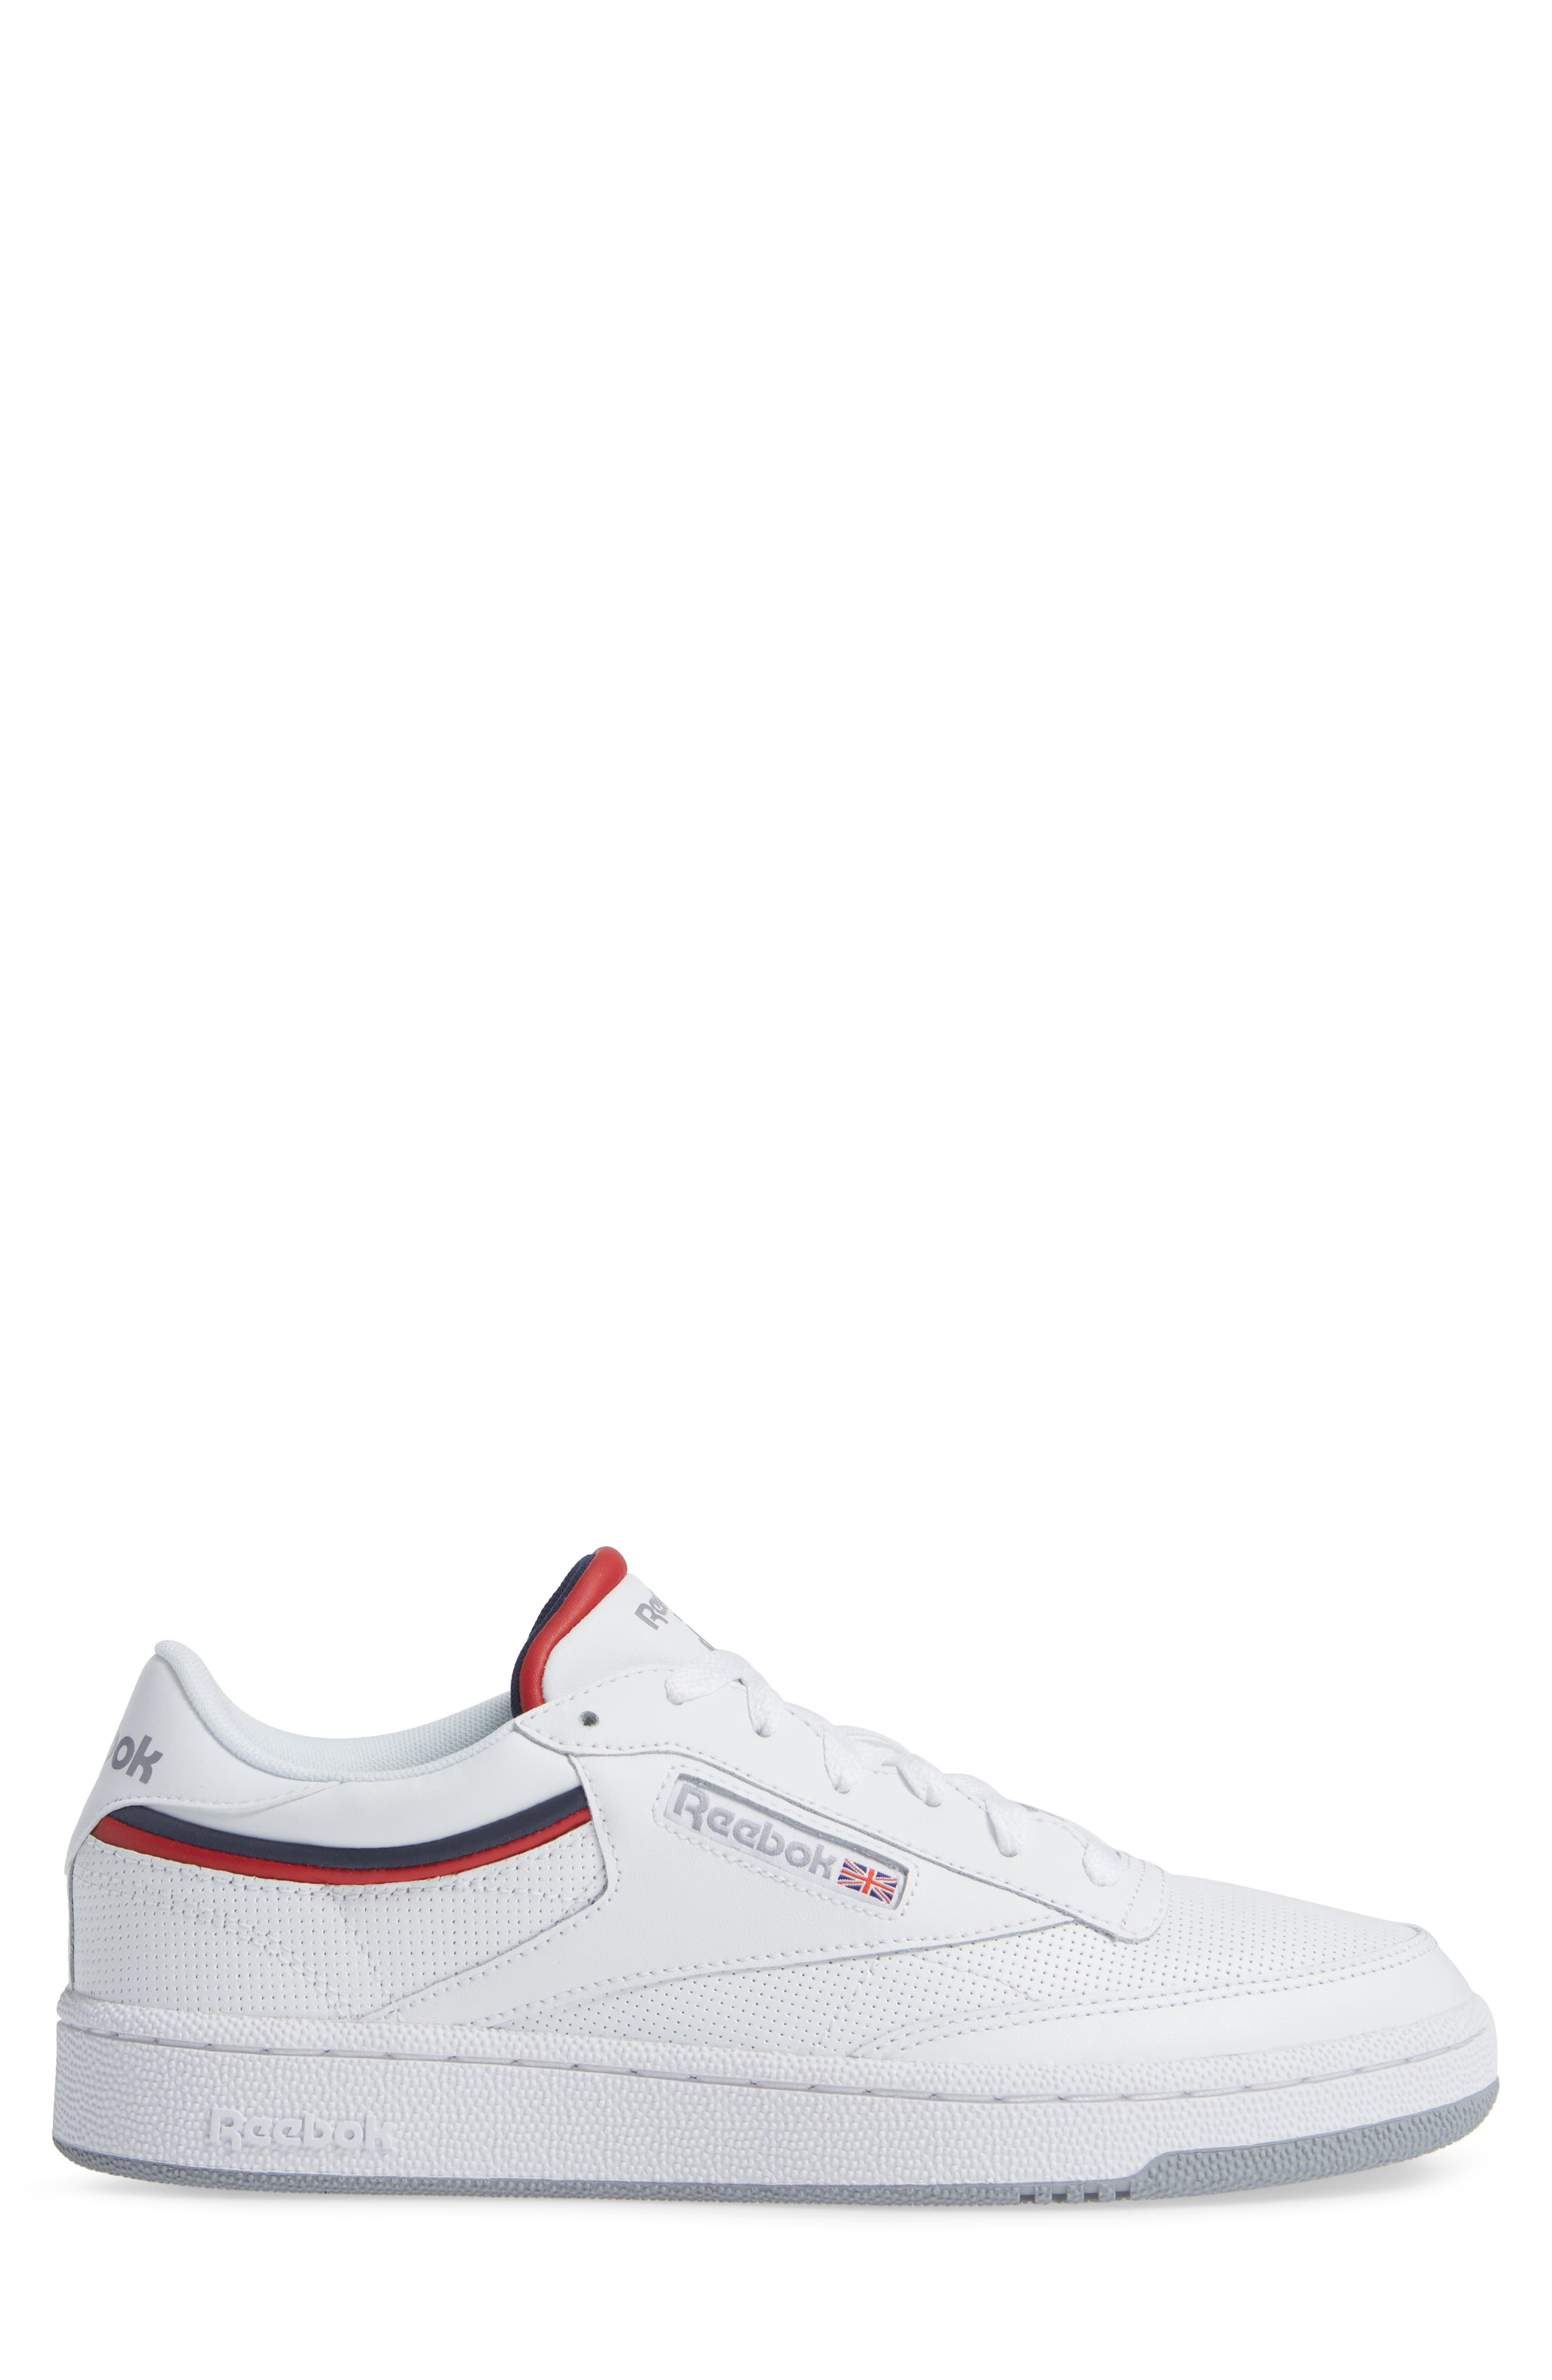 Club C 85 Sneaker,                             Alternate thumbnail 3, color,                             WHITE/ COLLEGIATE NAVY/ RED